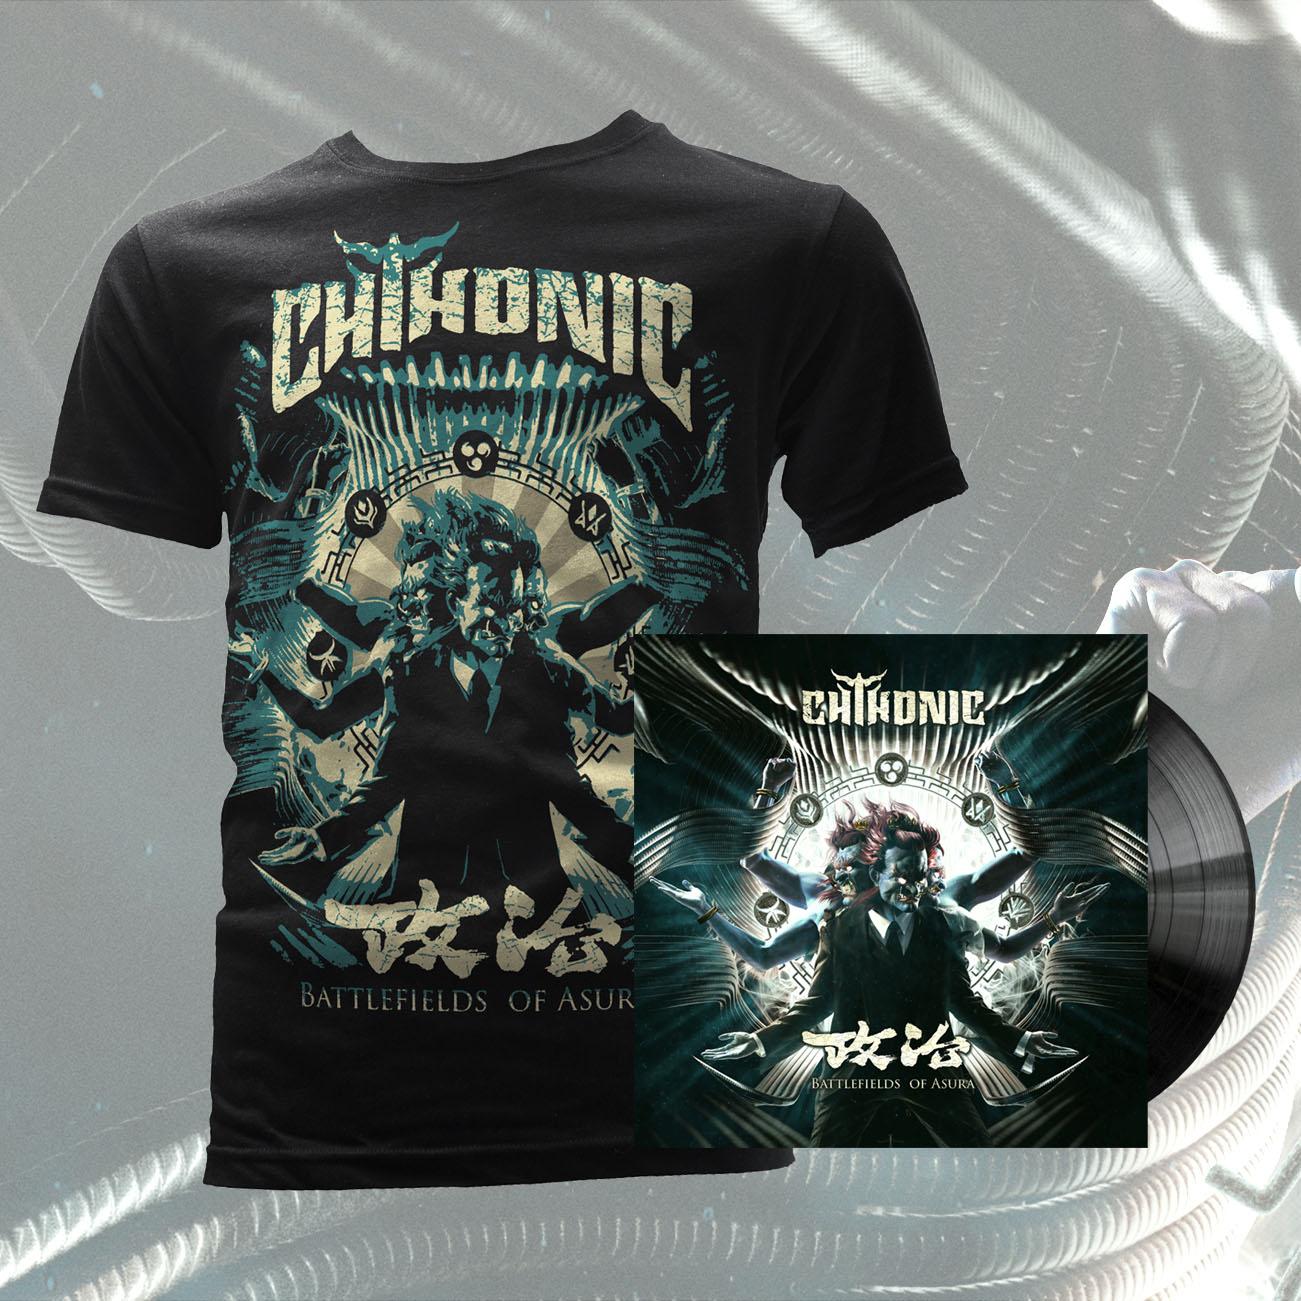 CHTHONIC - 'Battlefields of Asura' (Taiwanese Version LP) + T-Shirt Bundle - CHTHONIC